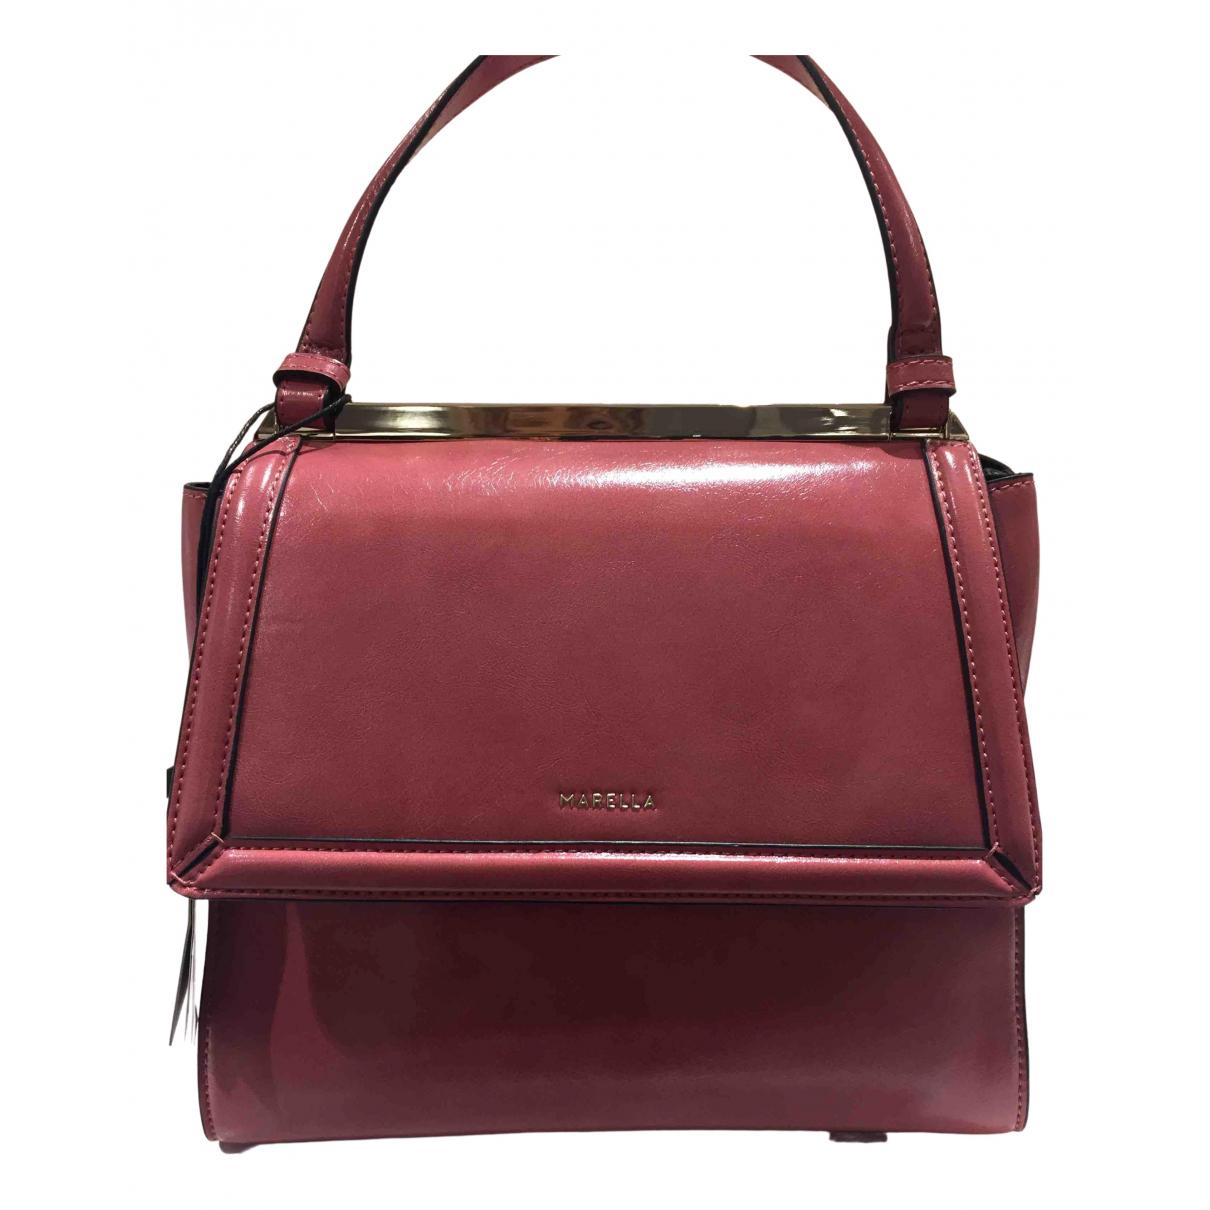 Marella \N Handtasche in  Rosa Synthetik